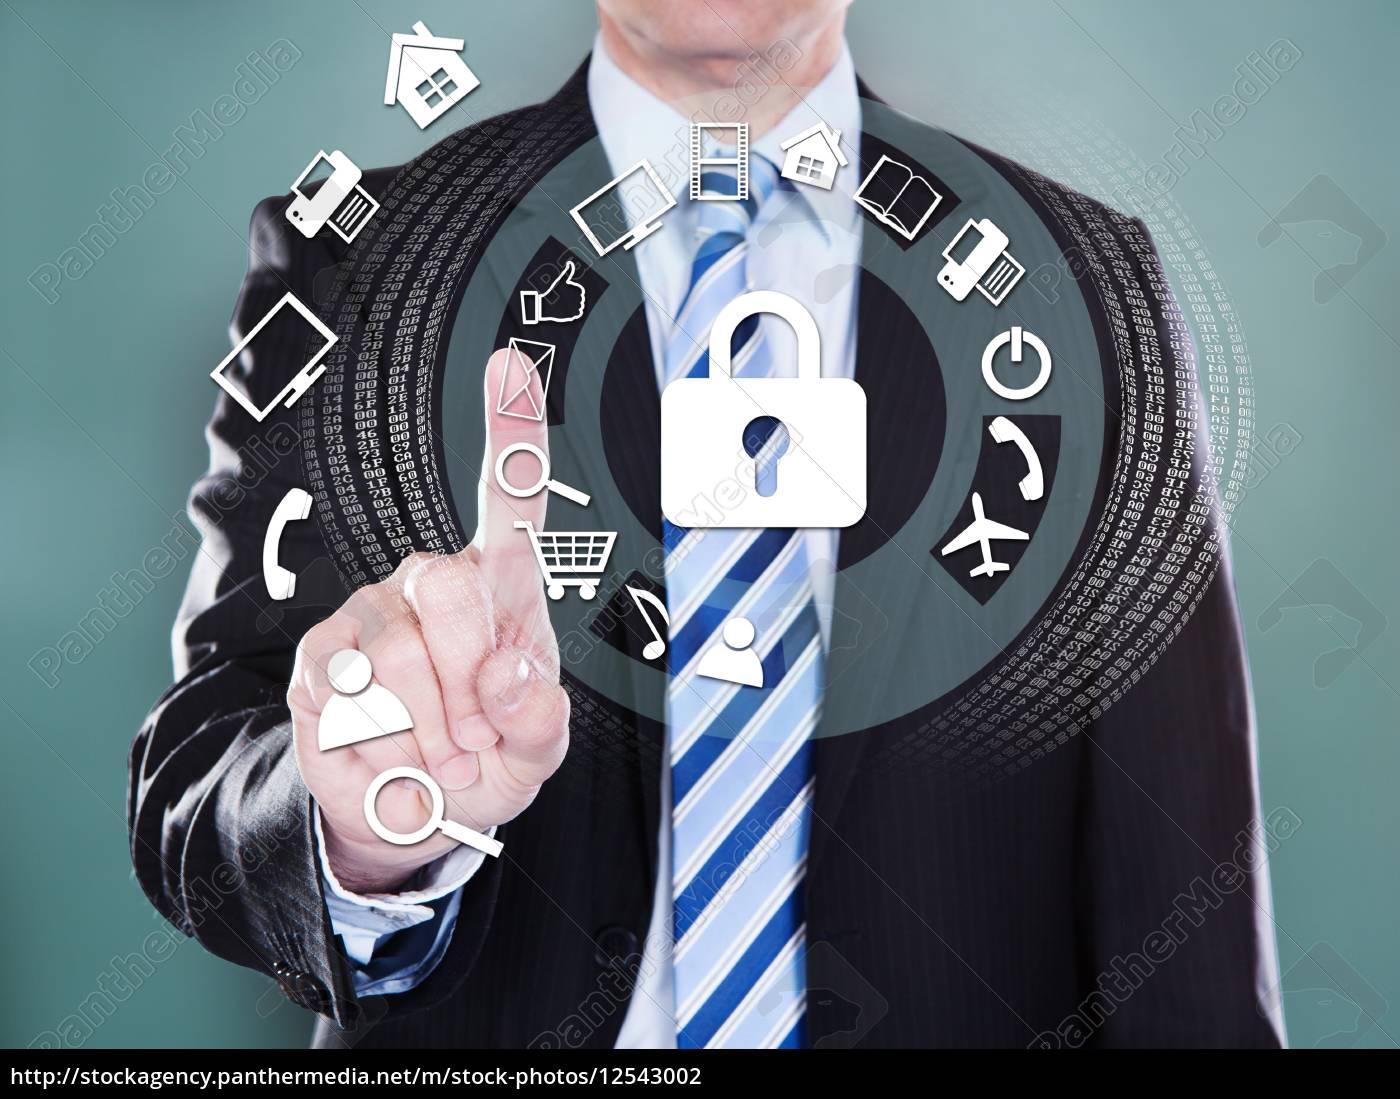 businessman, touching, the, screen - 12543002